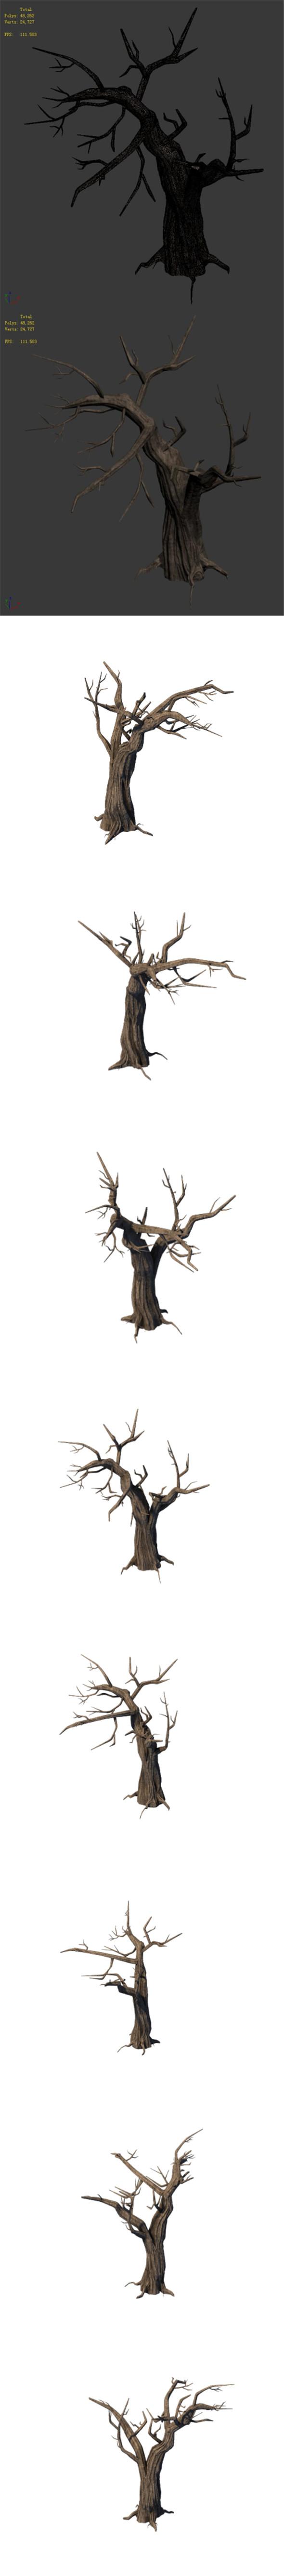 3DOcean General Plant Trees 05 20162342